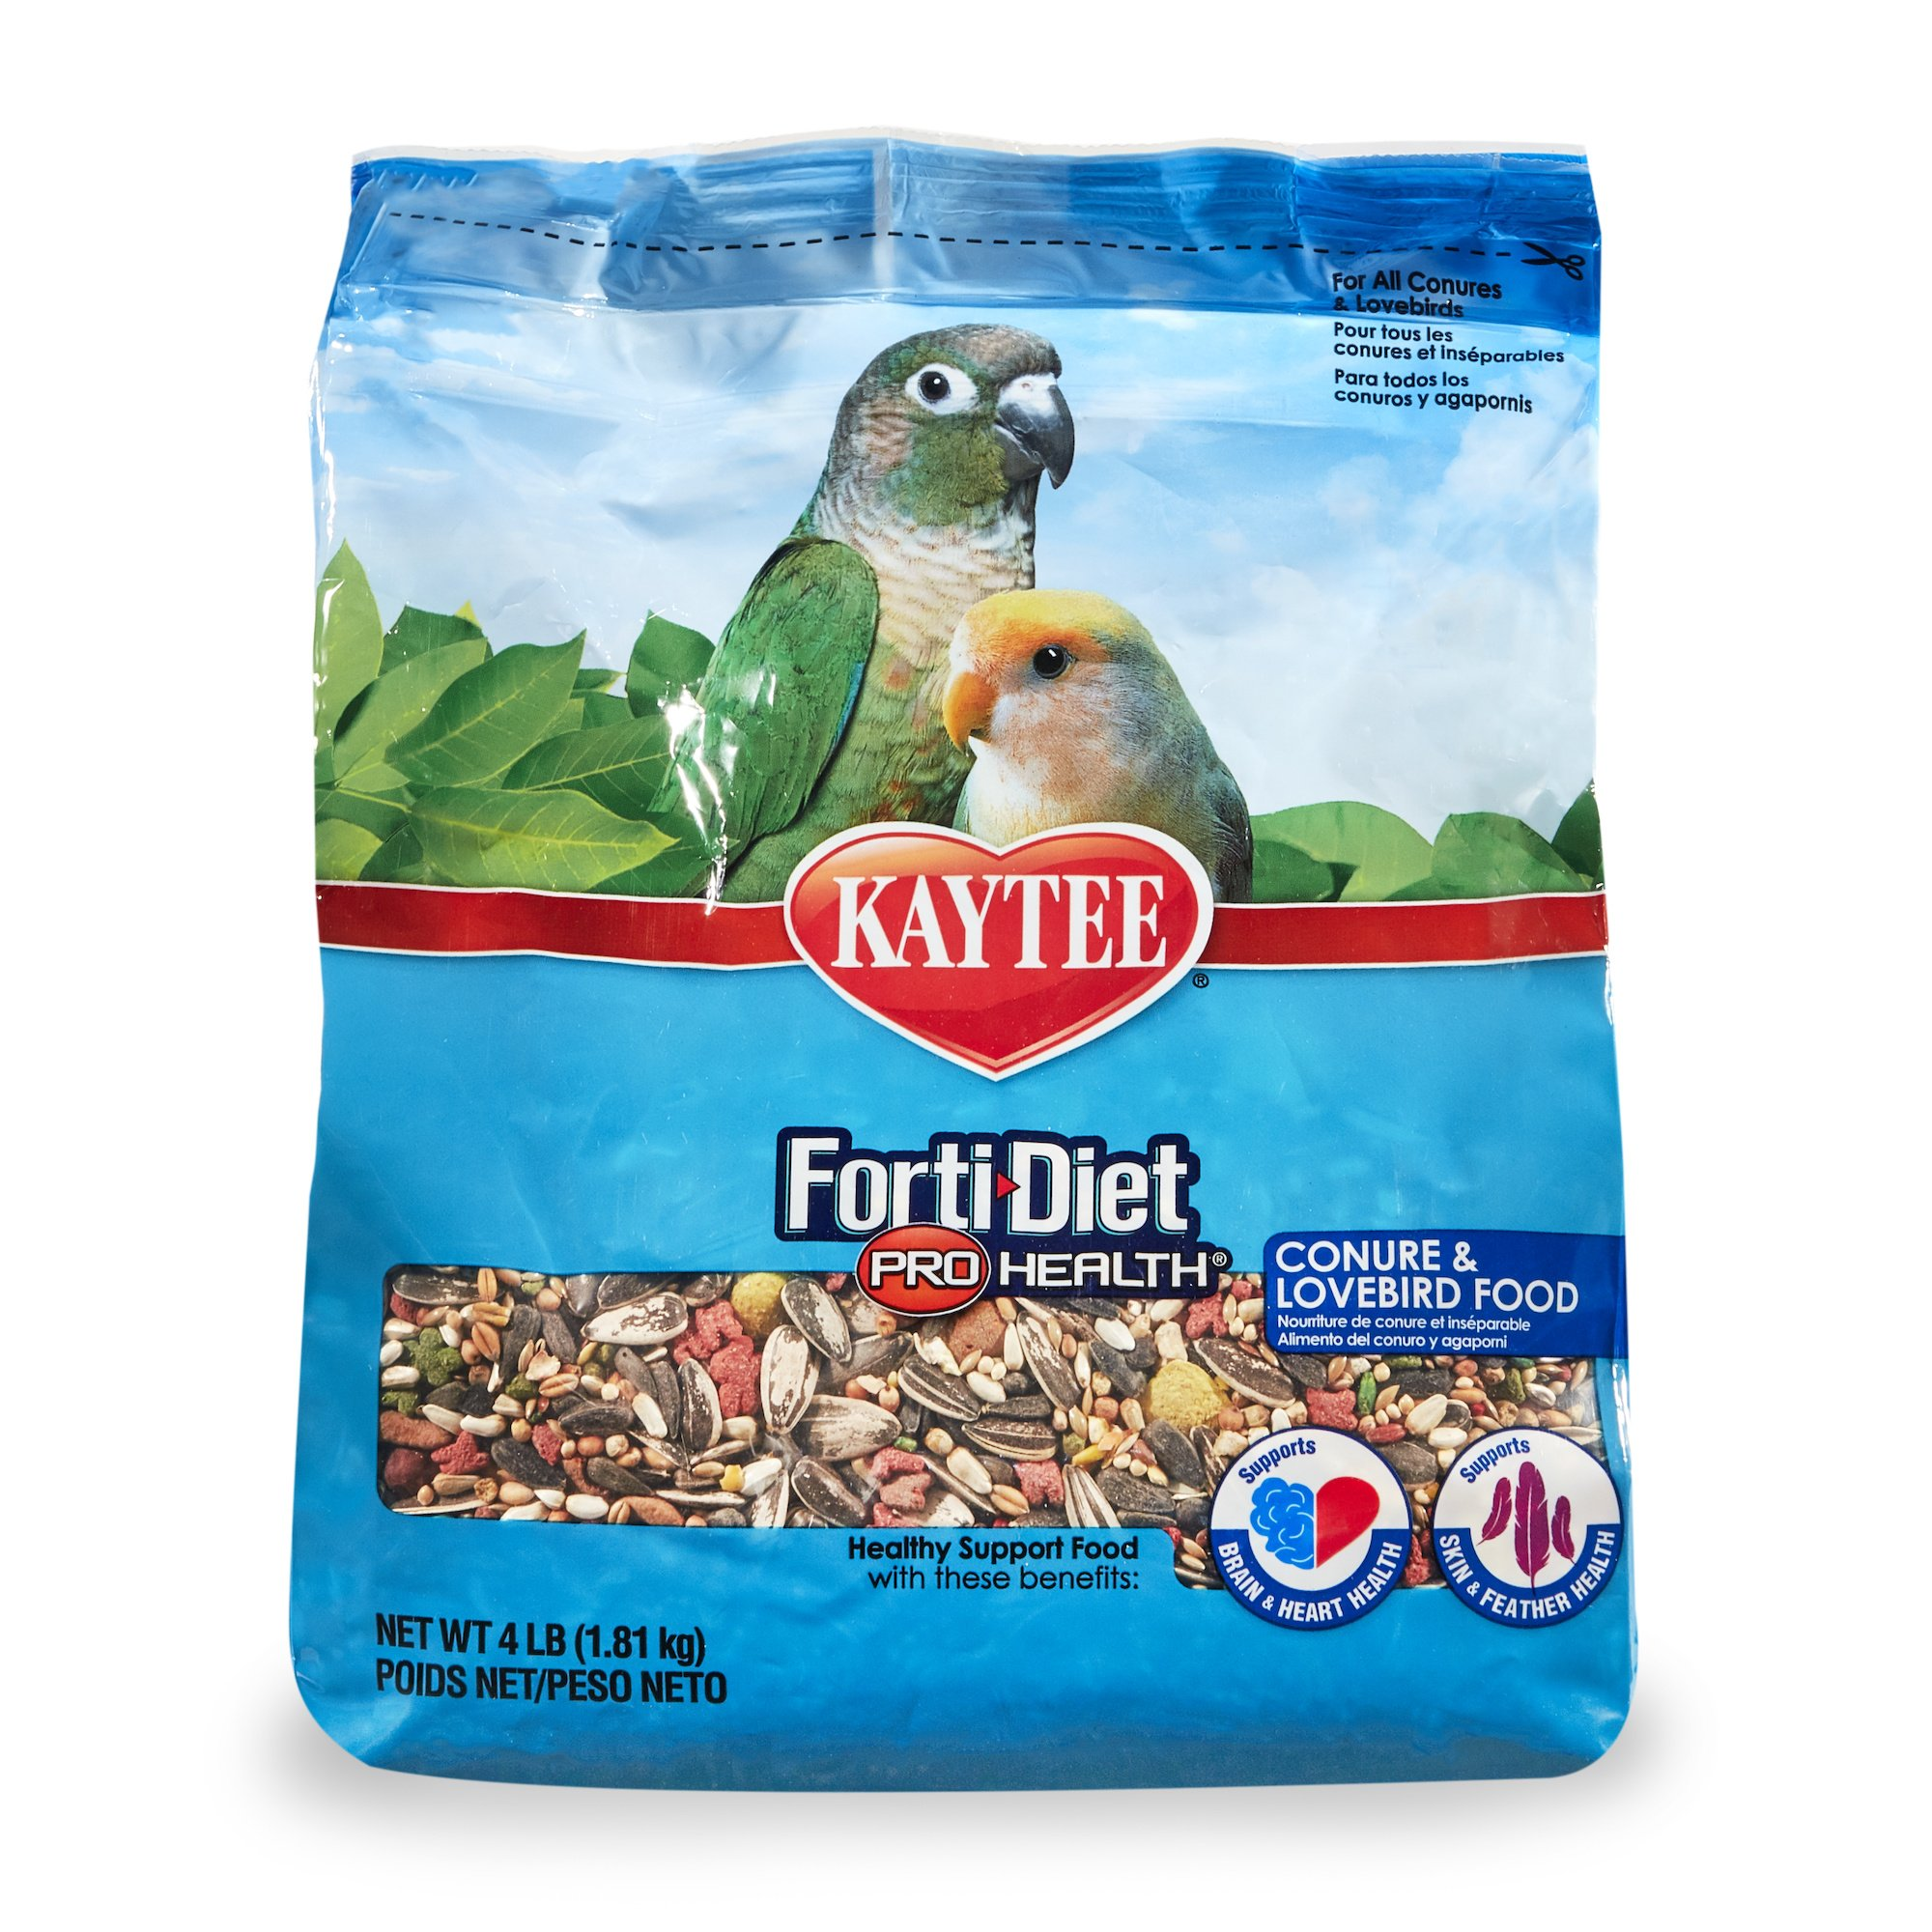 Kaytee Forti-Diet Pro Health Conure and Lovebird Food 4 lb by Kaytee